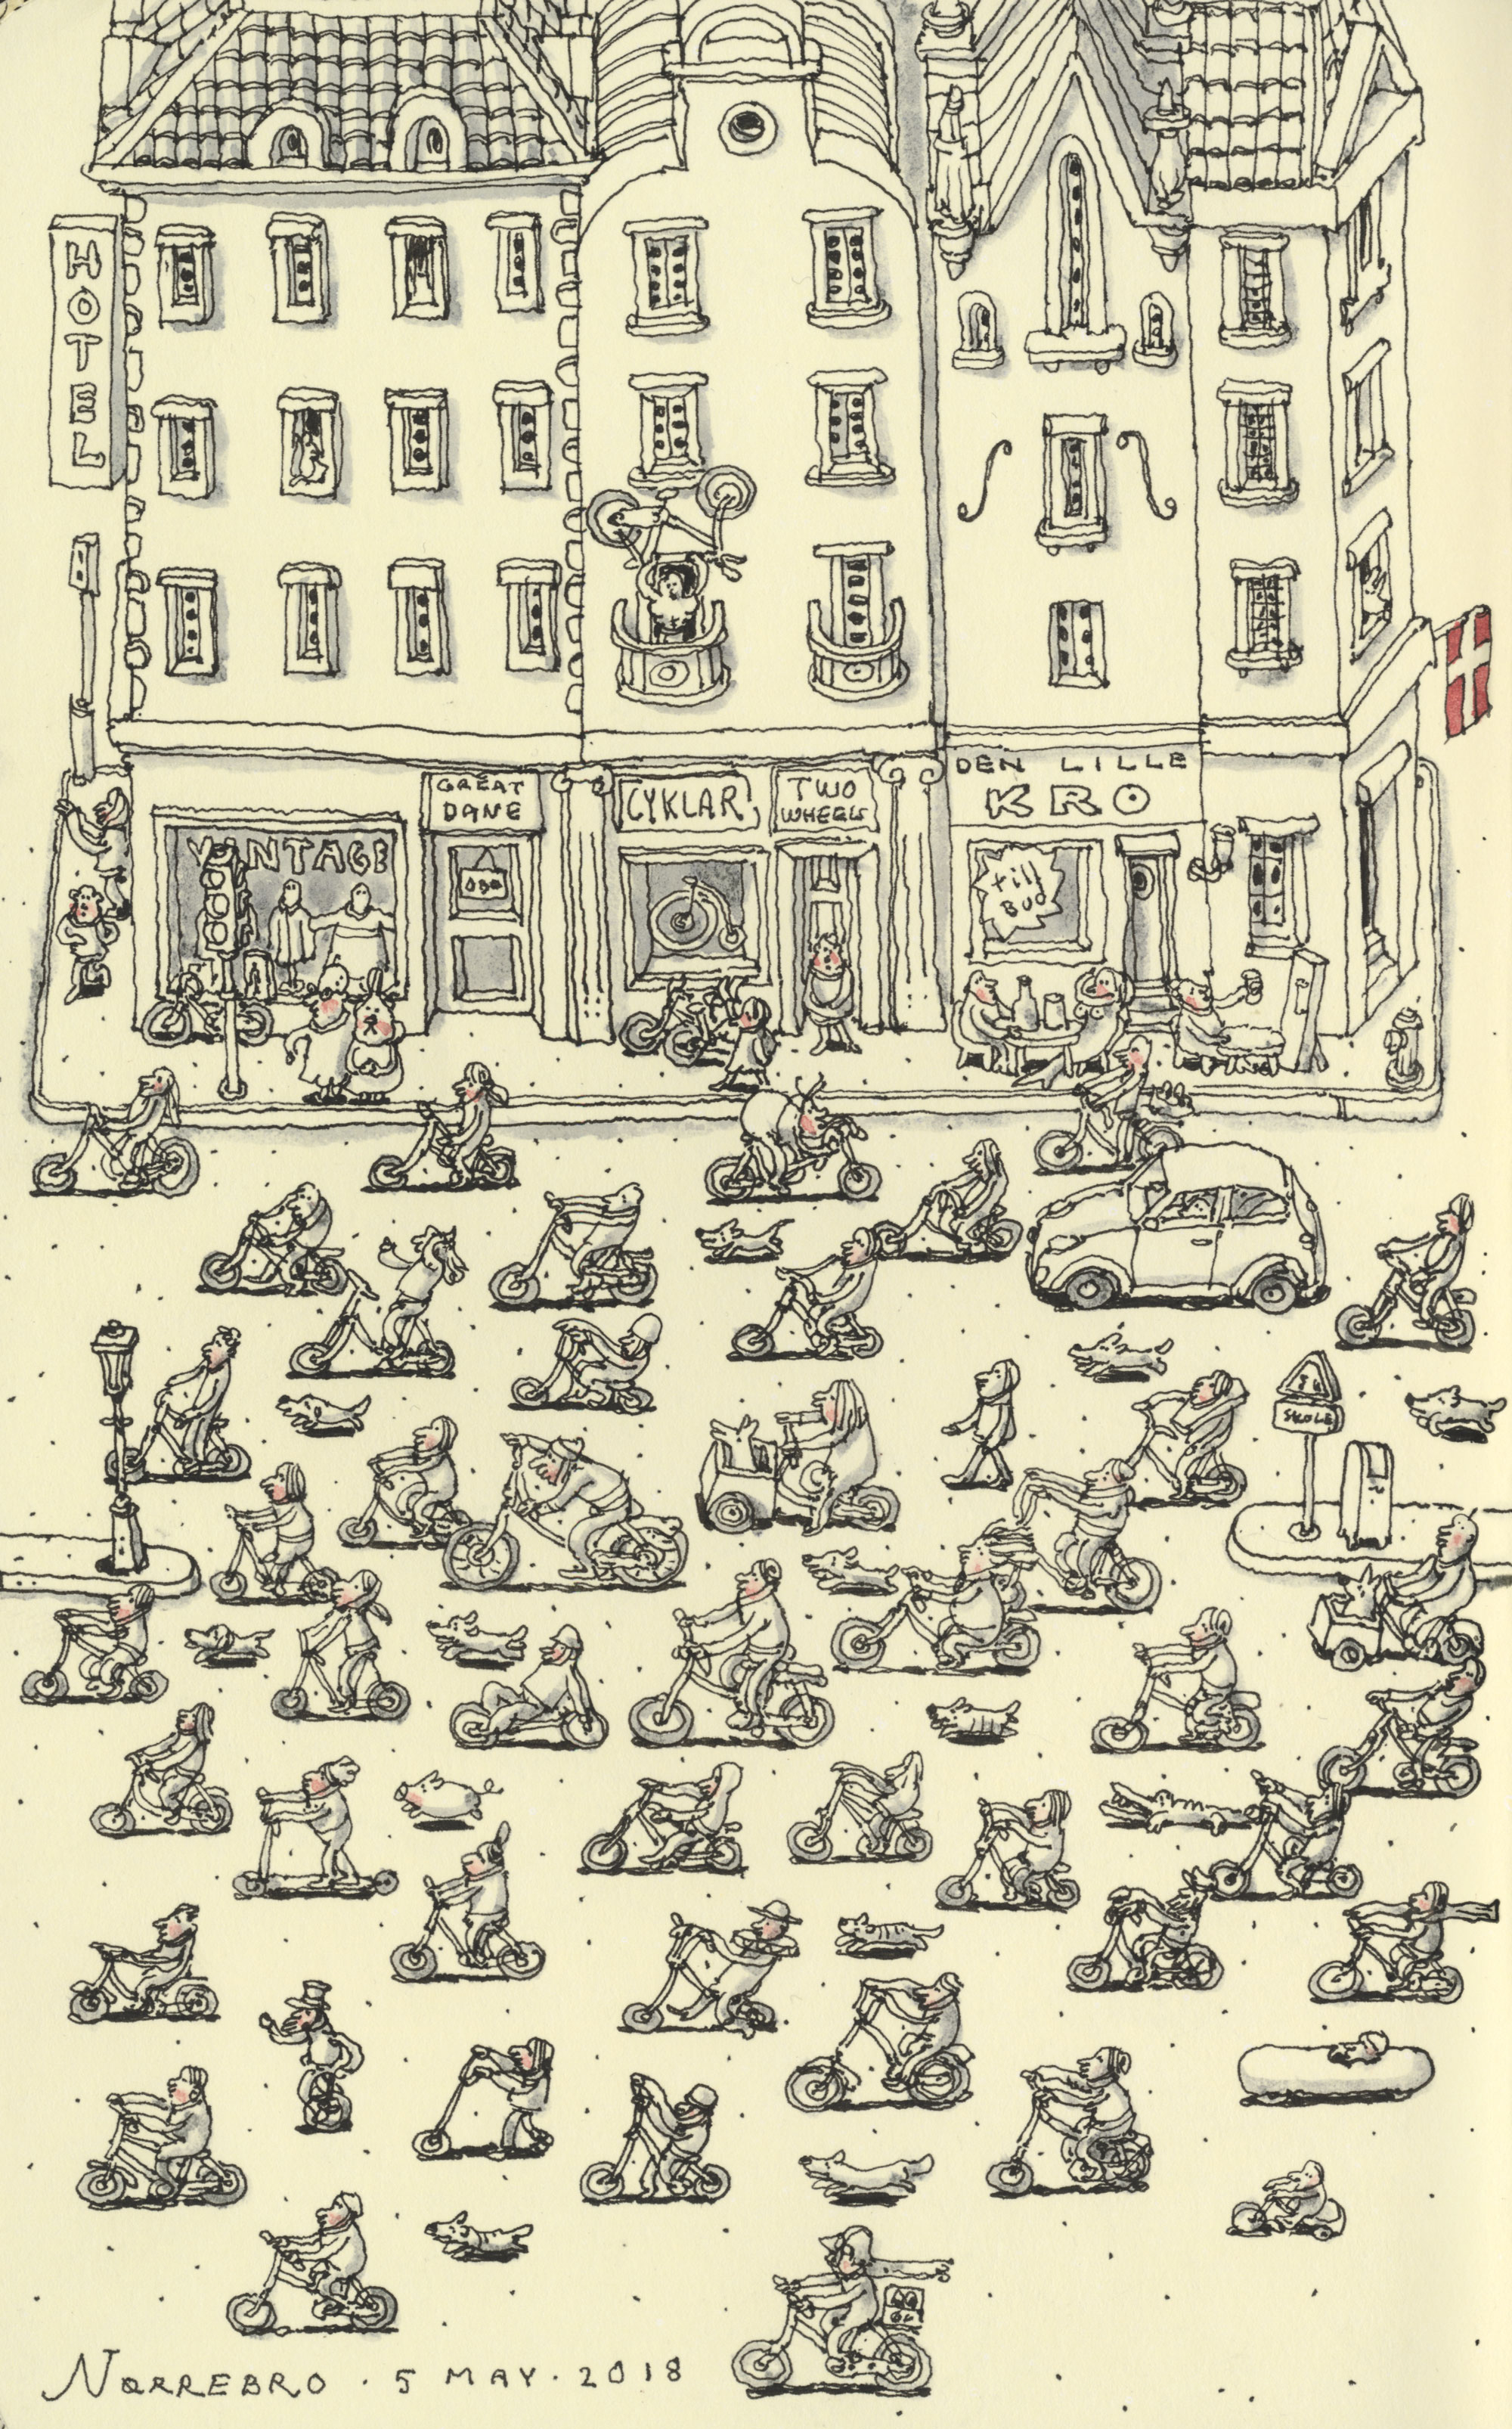 Copenhagen rush hour by MattiasA